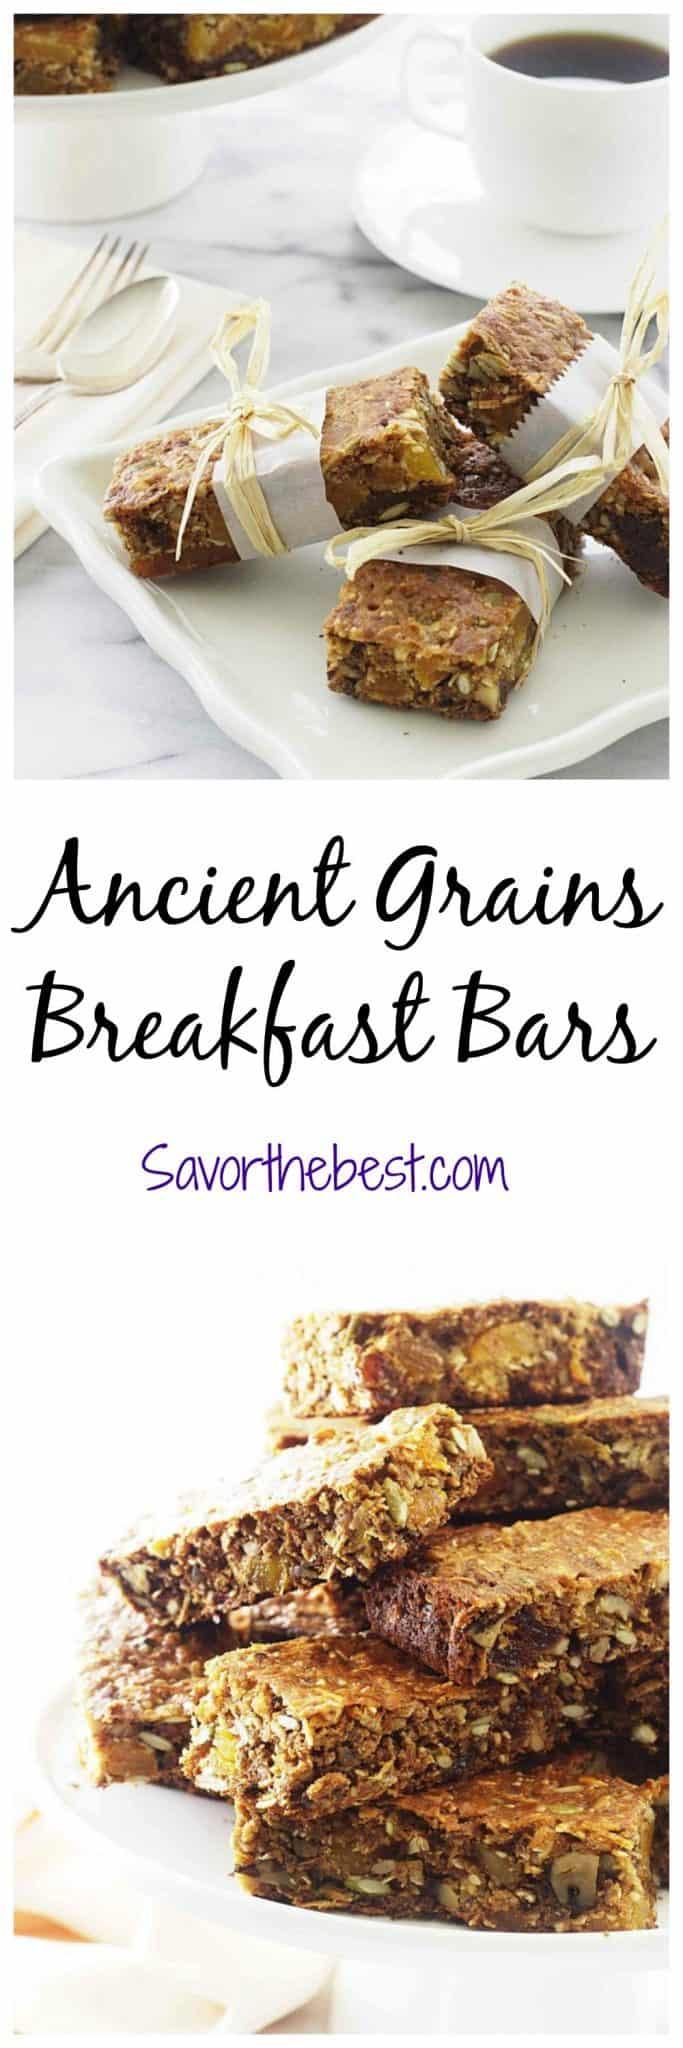 ancient grains breakfast bars